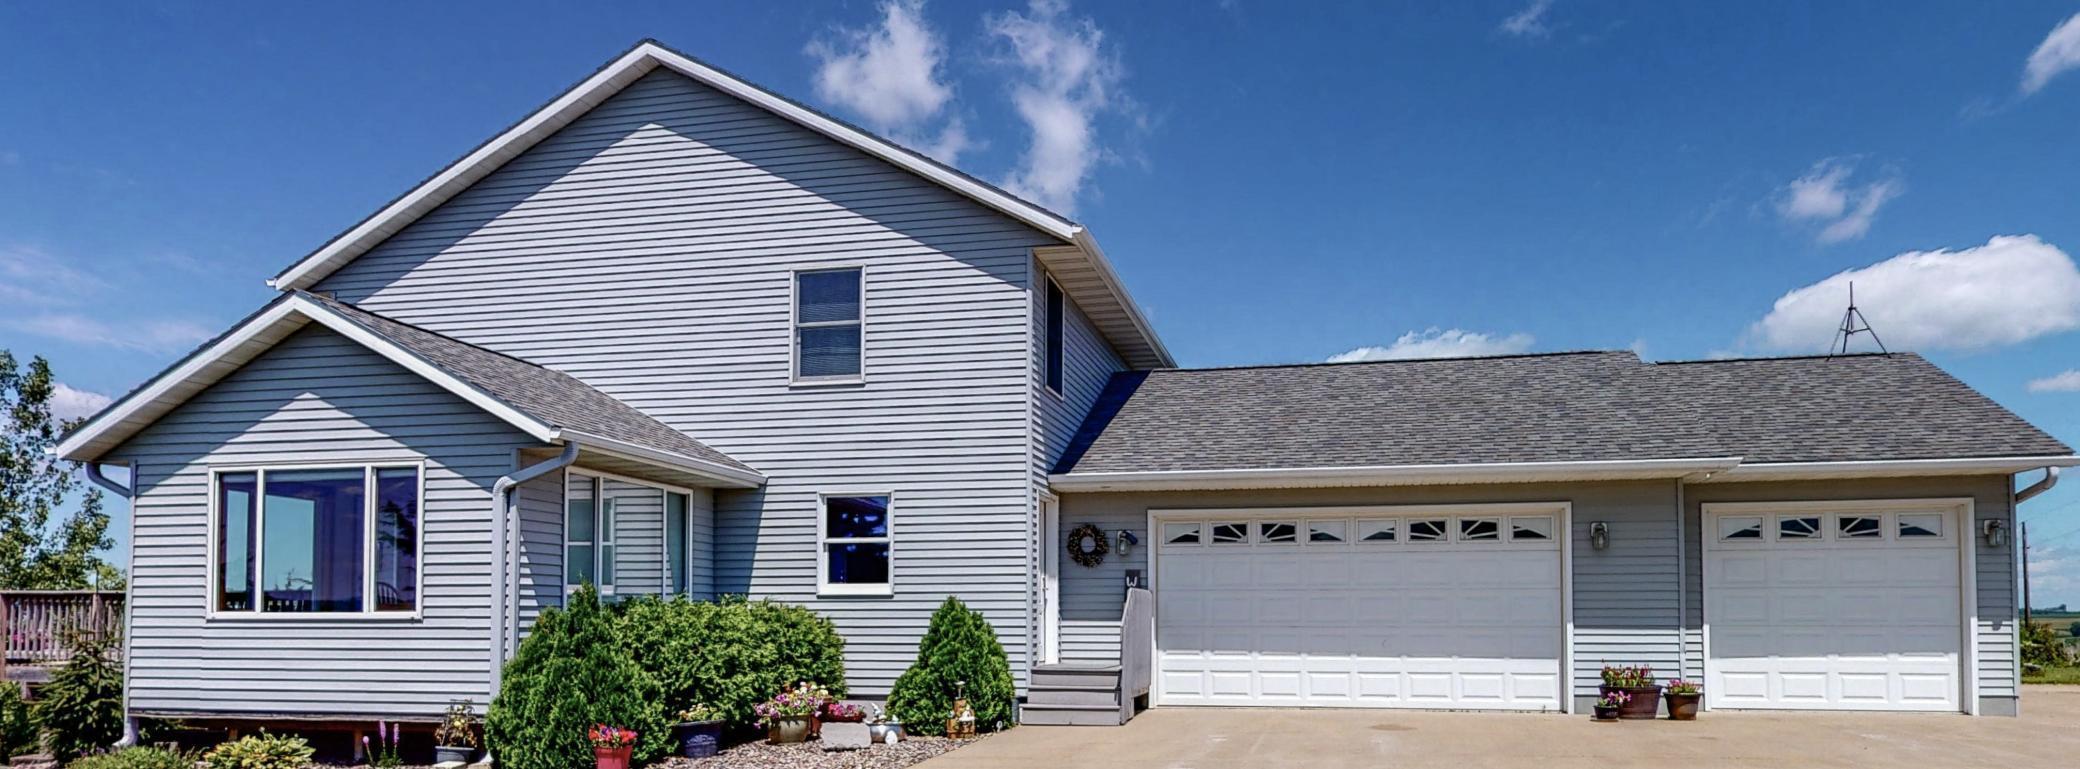 33756 315th Avenue Property Photo - Utica, MN real estate listing